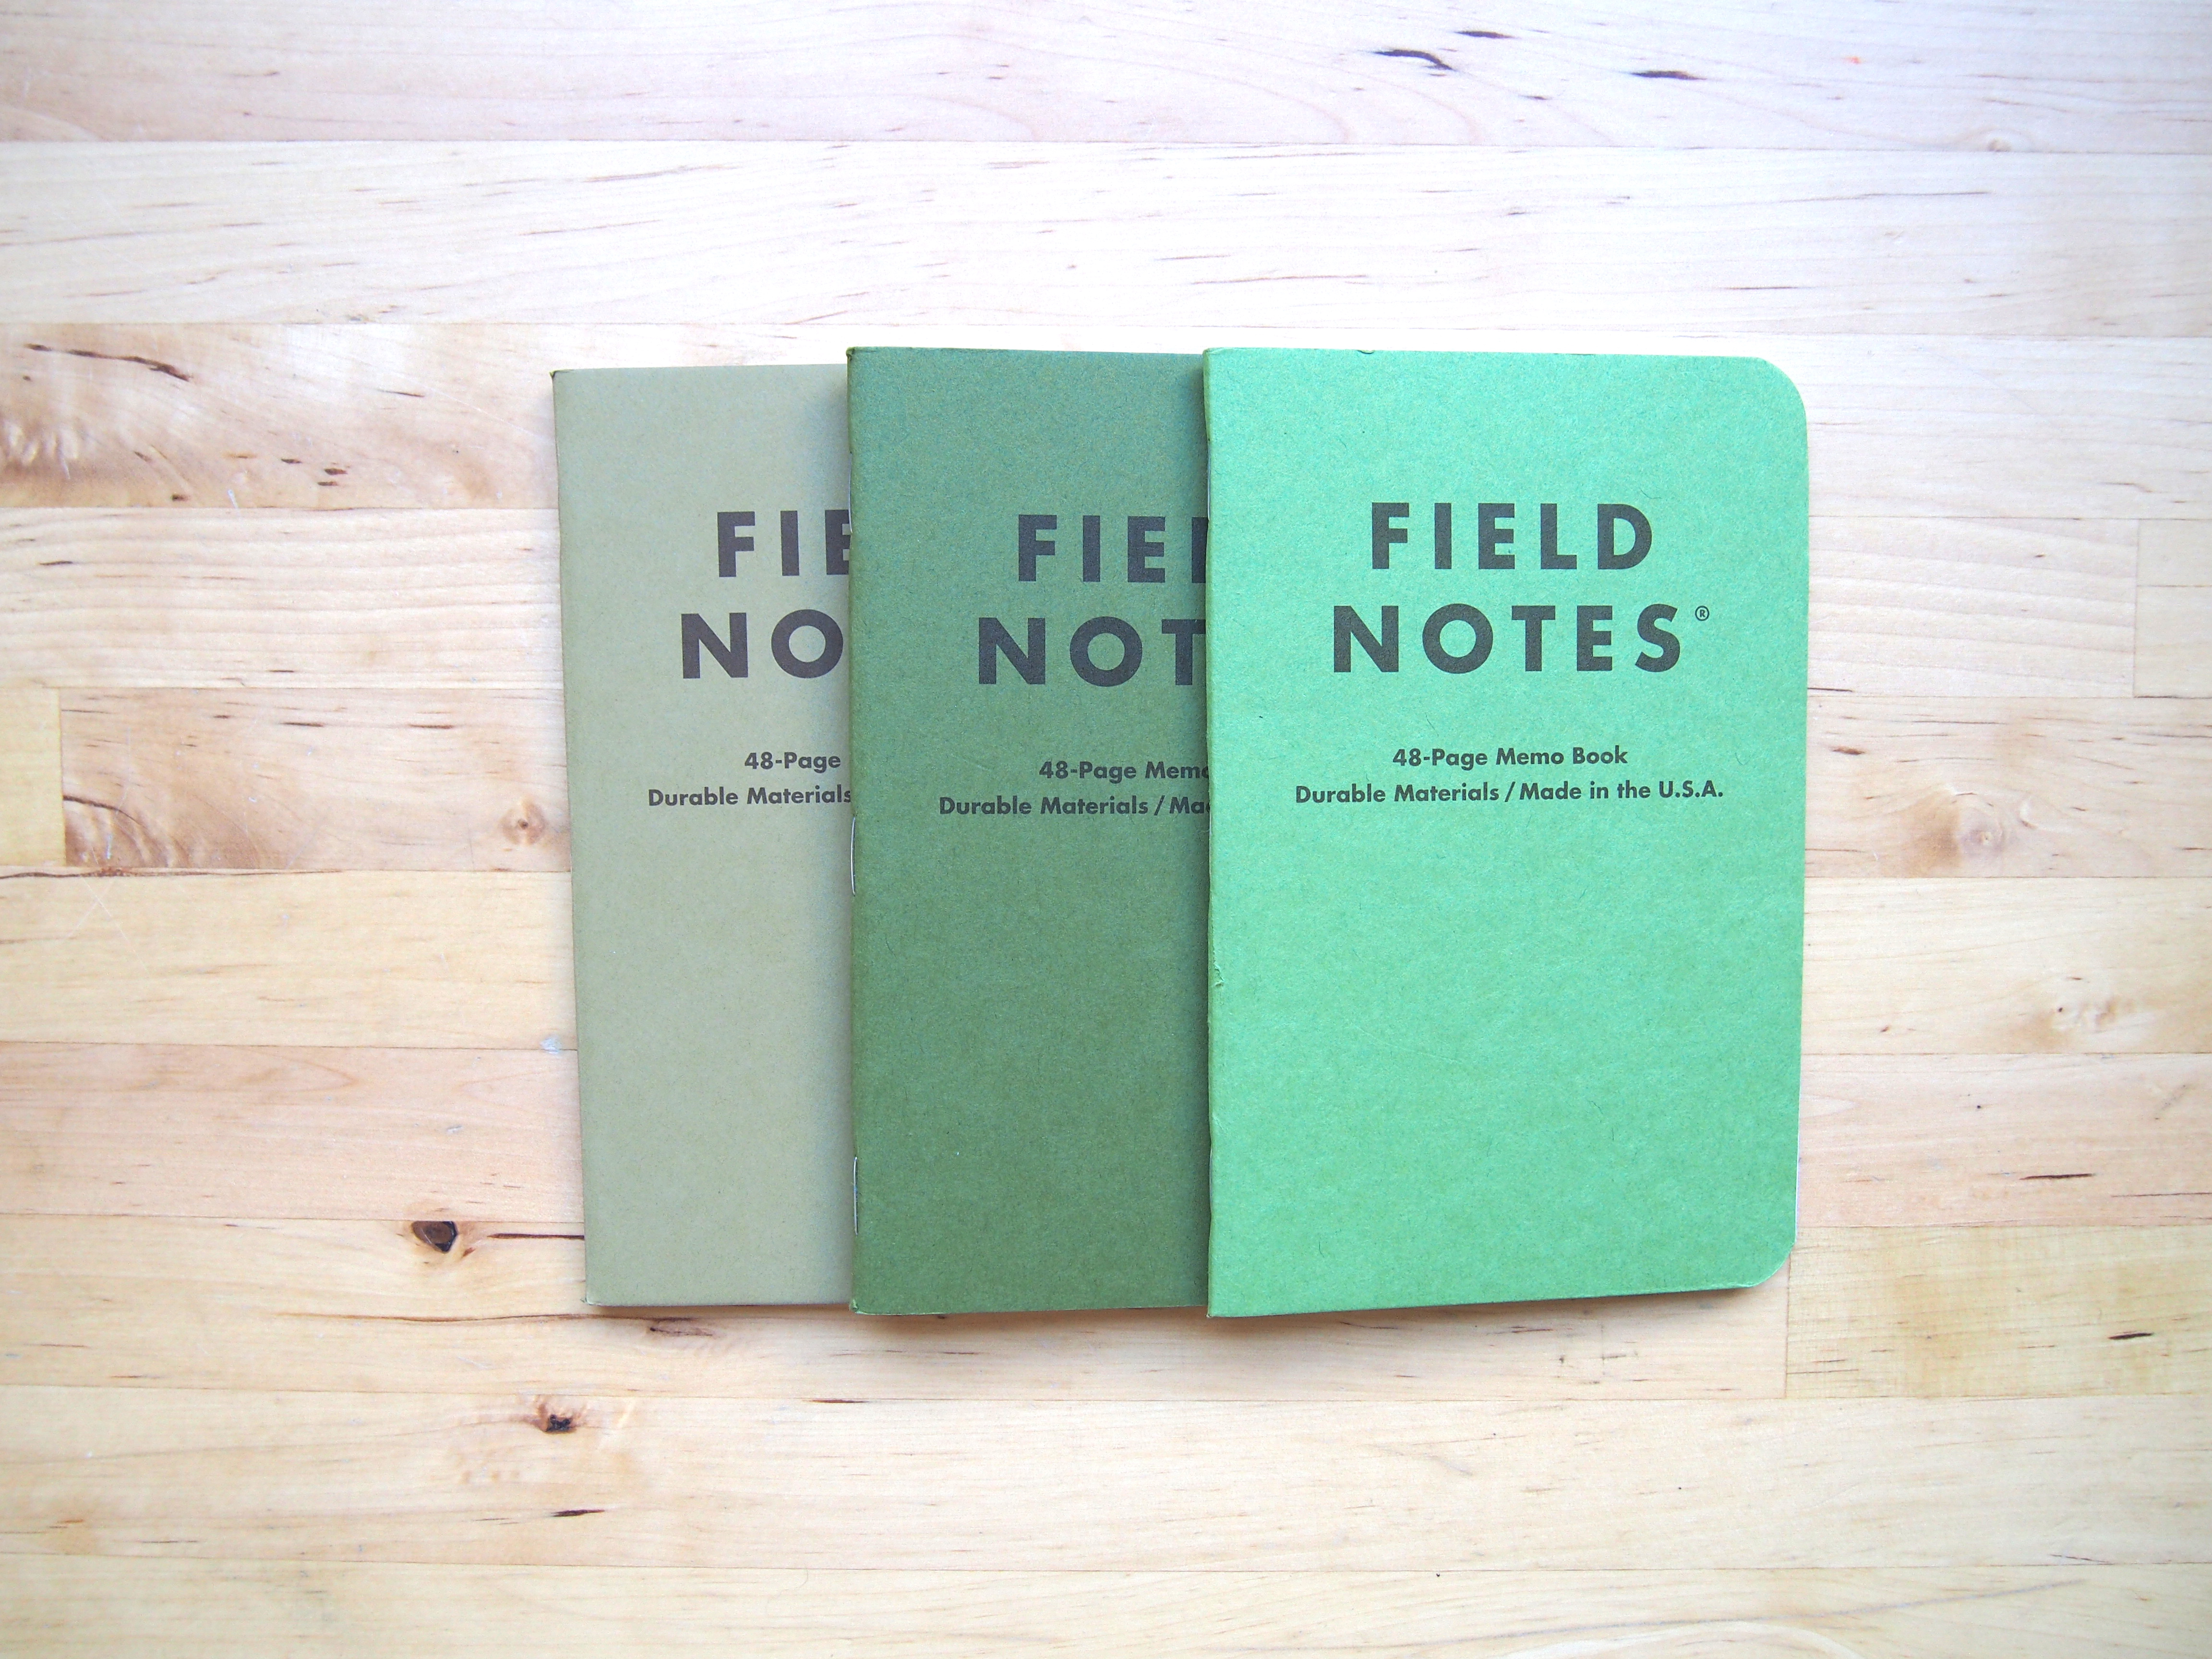 Shenandoah Field Notes Fall 2015 Seasonal Edition Wonder Pens Blog wonderpens.ca Toronto Canada